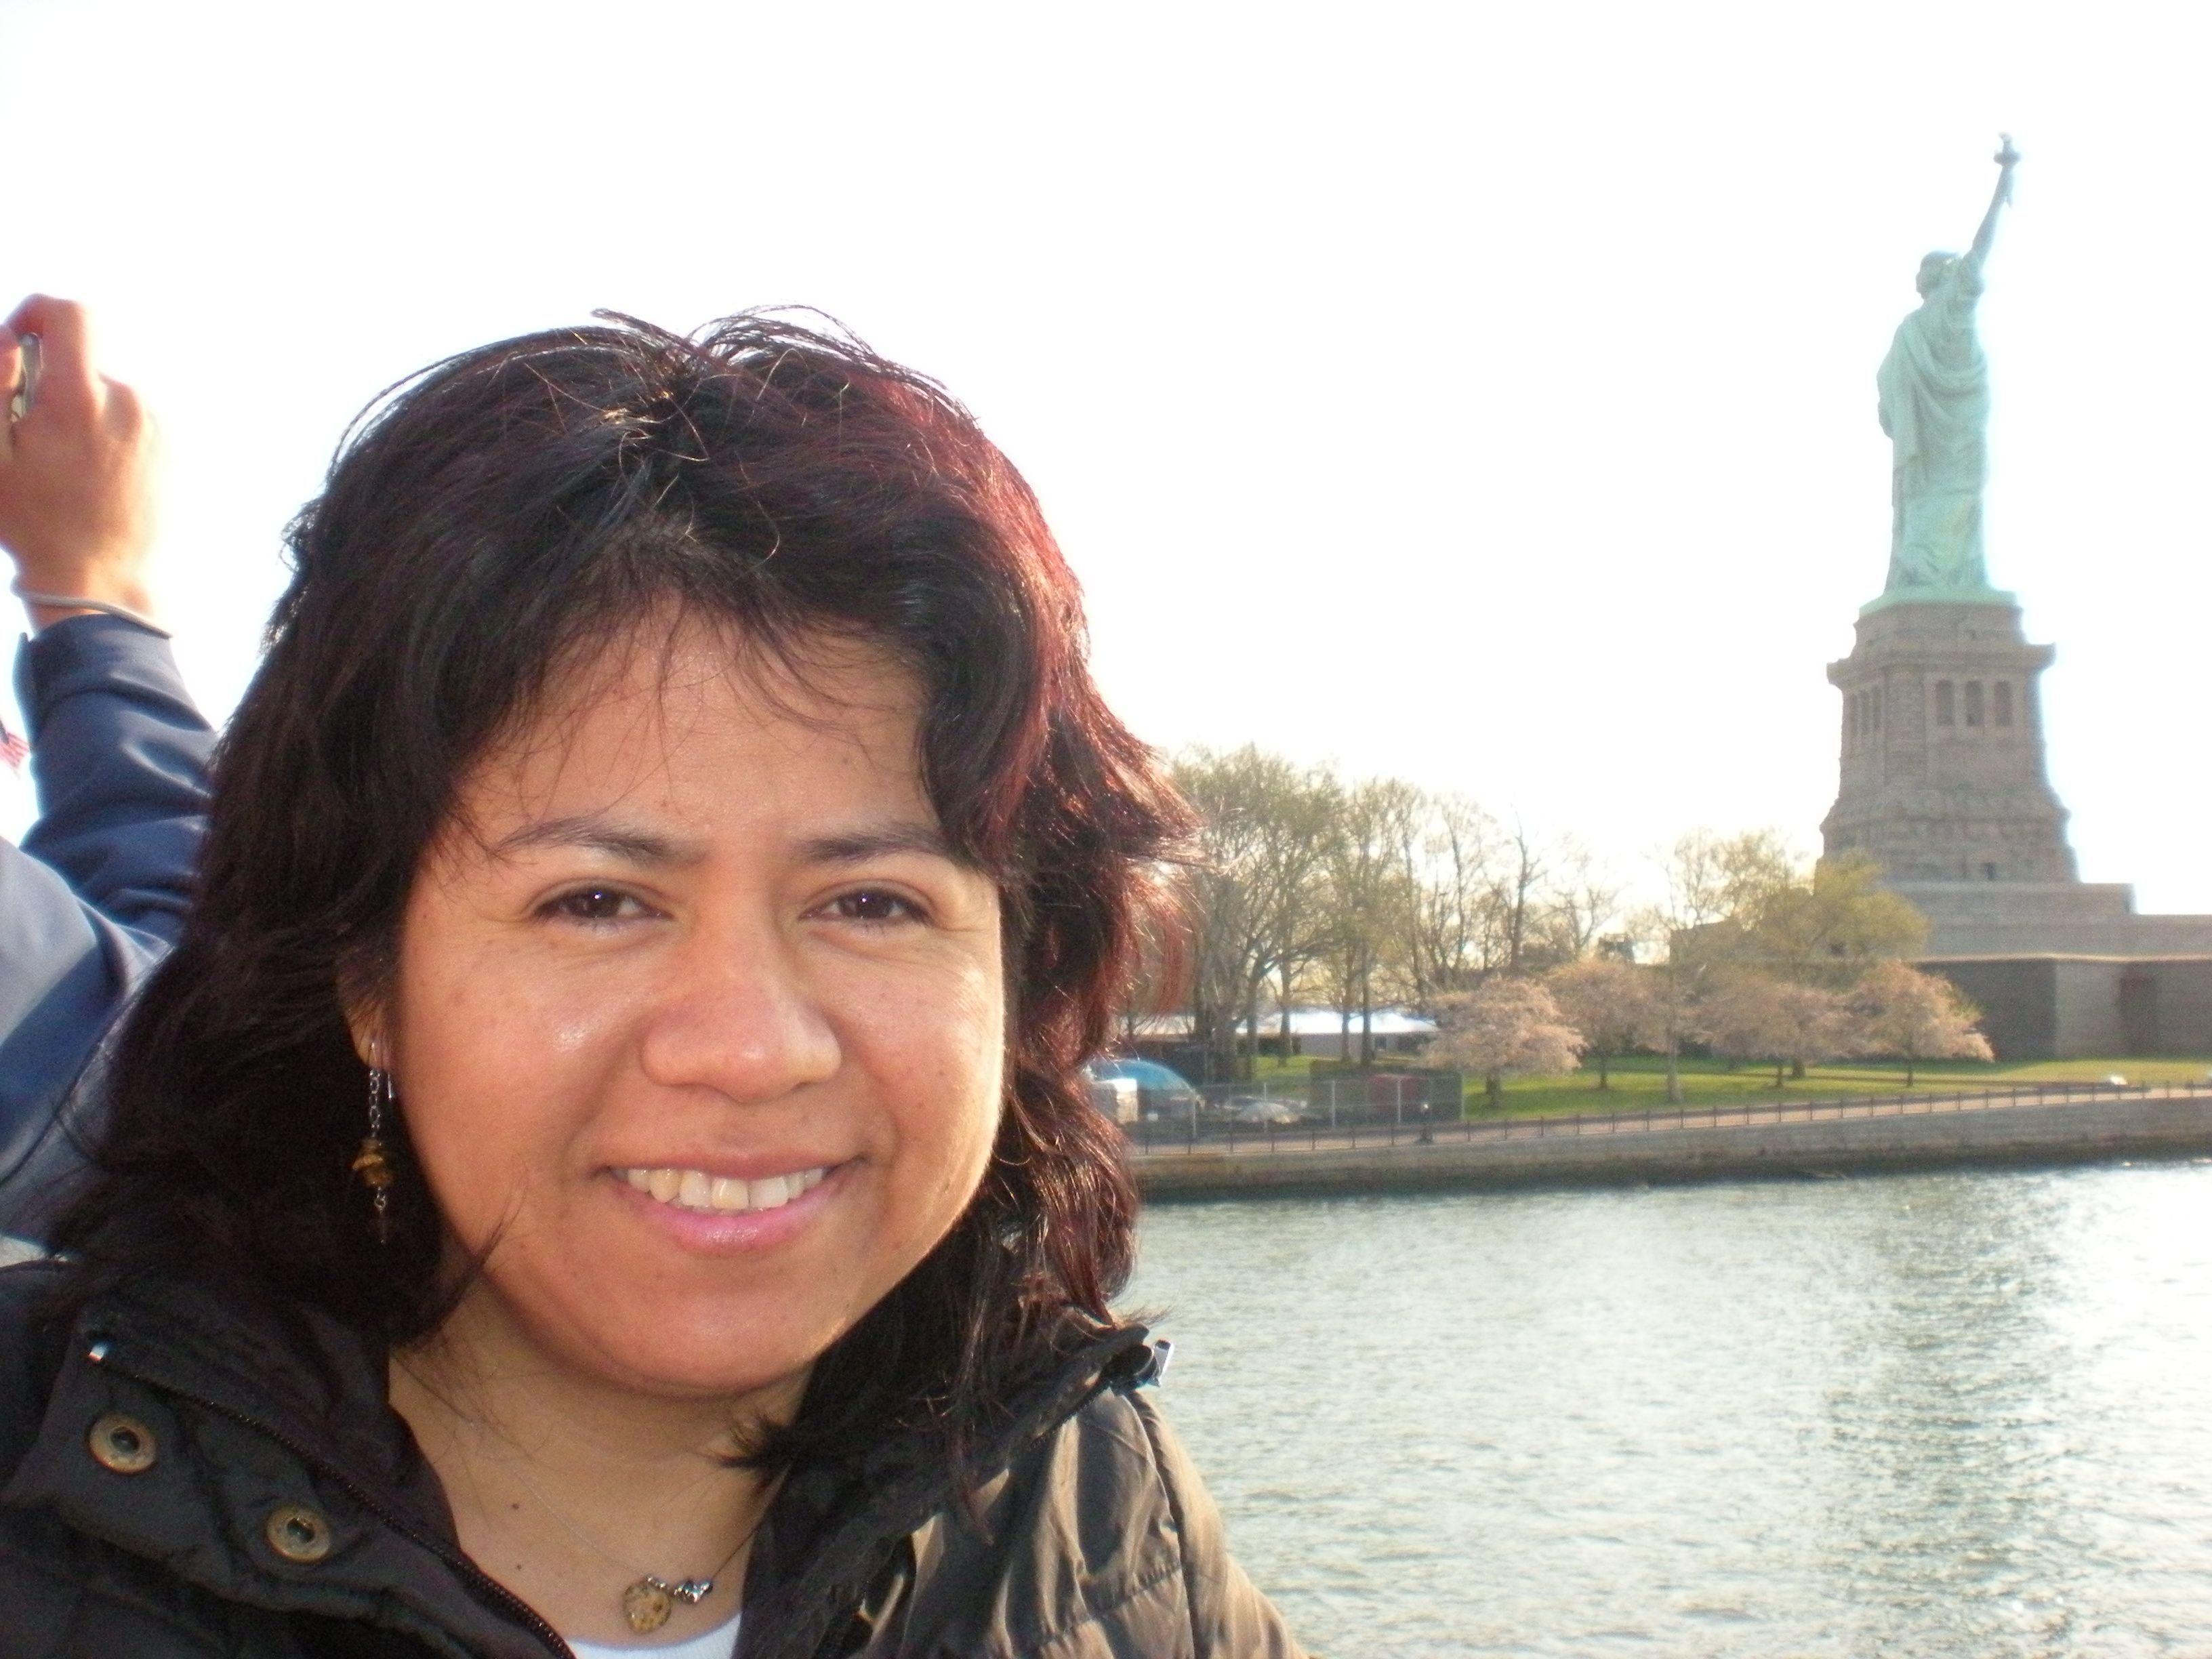 alexandria latin singles Alexandria ocasio-cortez,  dating follow us: news   28-year-old socialist latina woman from bronx hailed as 'future of democrats' defeats joe crowley in primary.